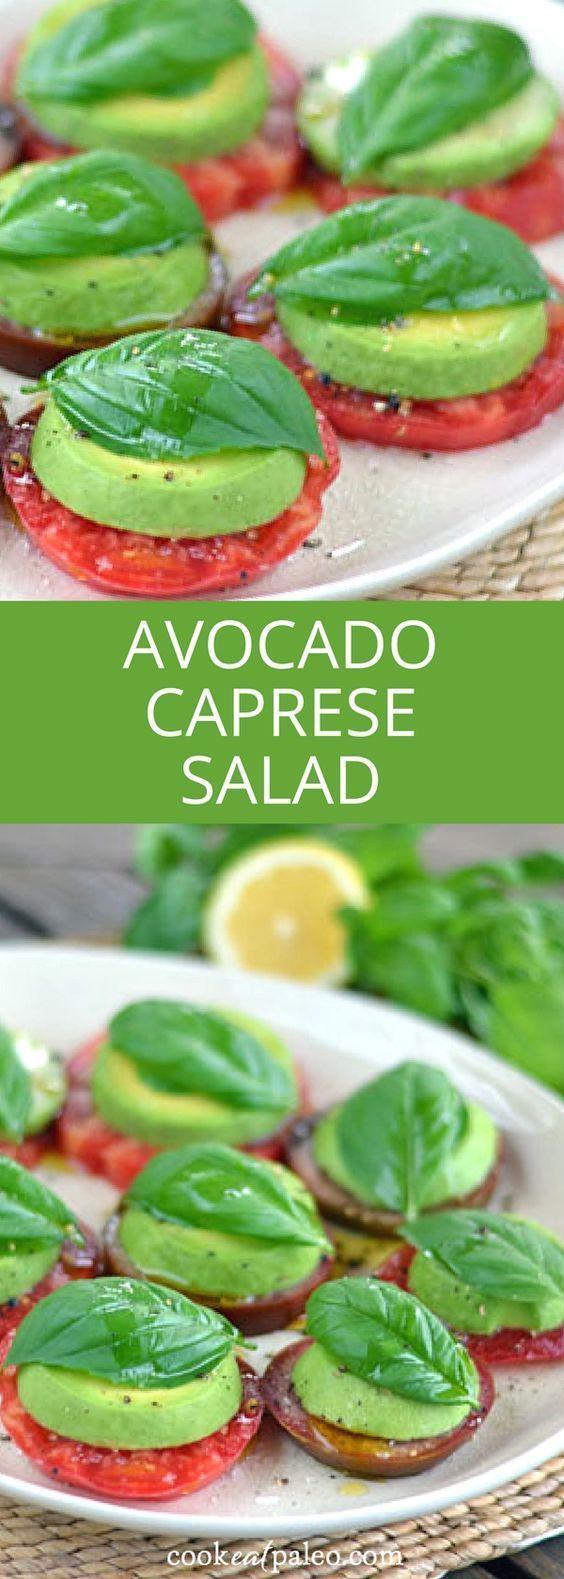 Avocado Caprese Salad, Avocado Caprese Salad,